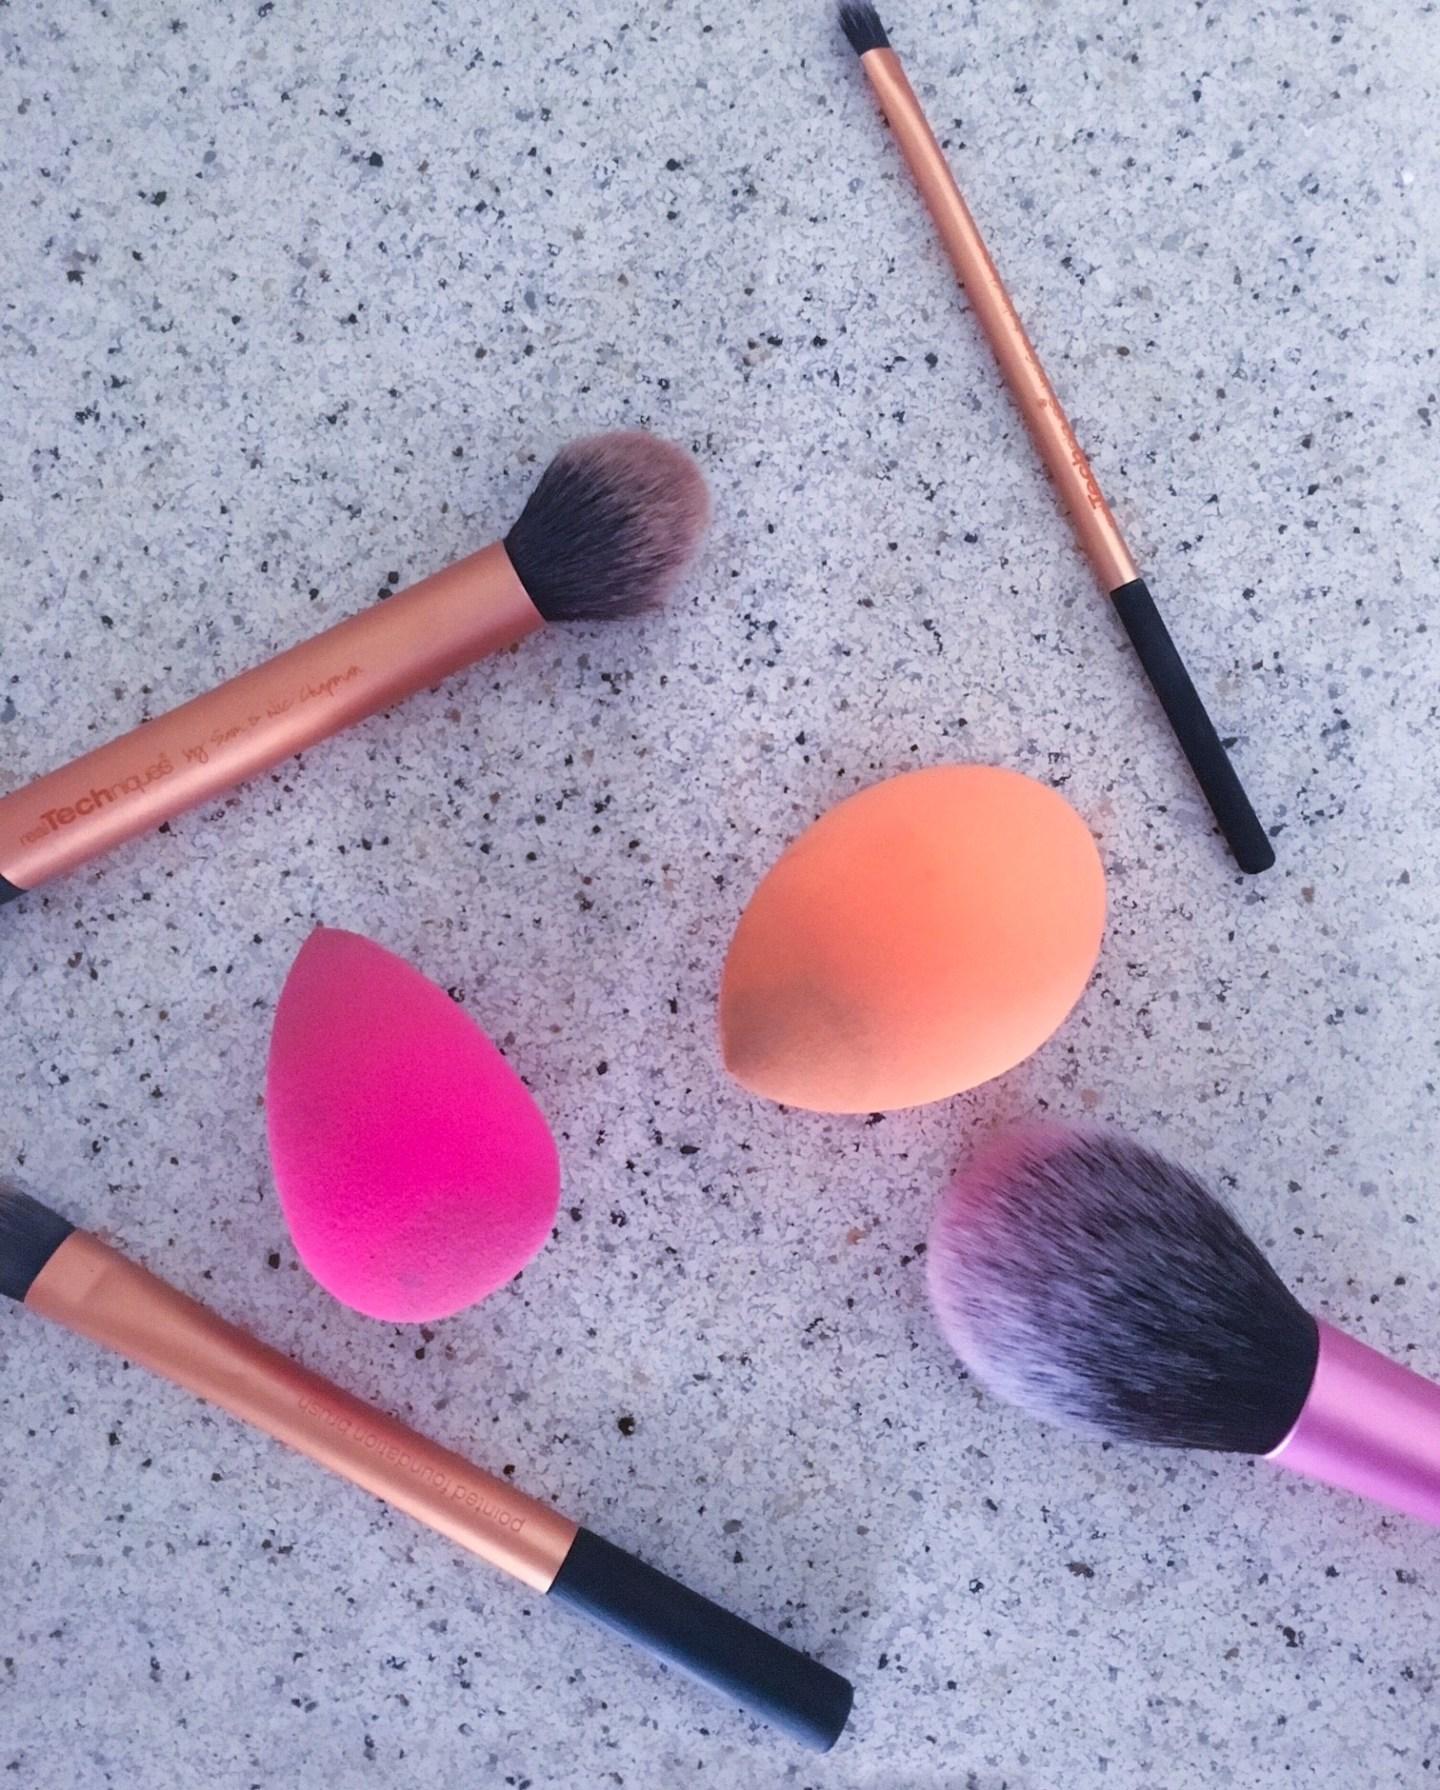 Battle of the Beauty Sponges! Real Techniques vs. Beauty Blender